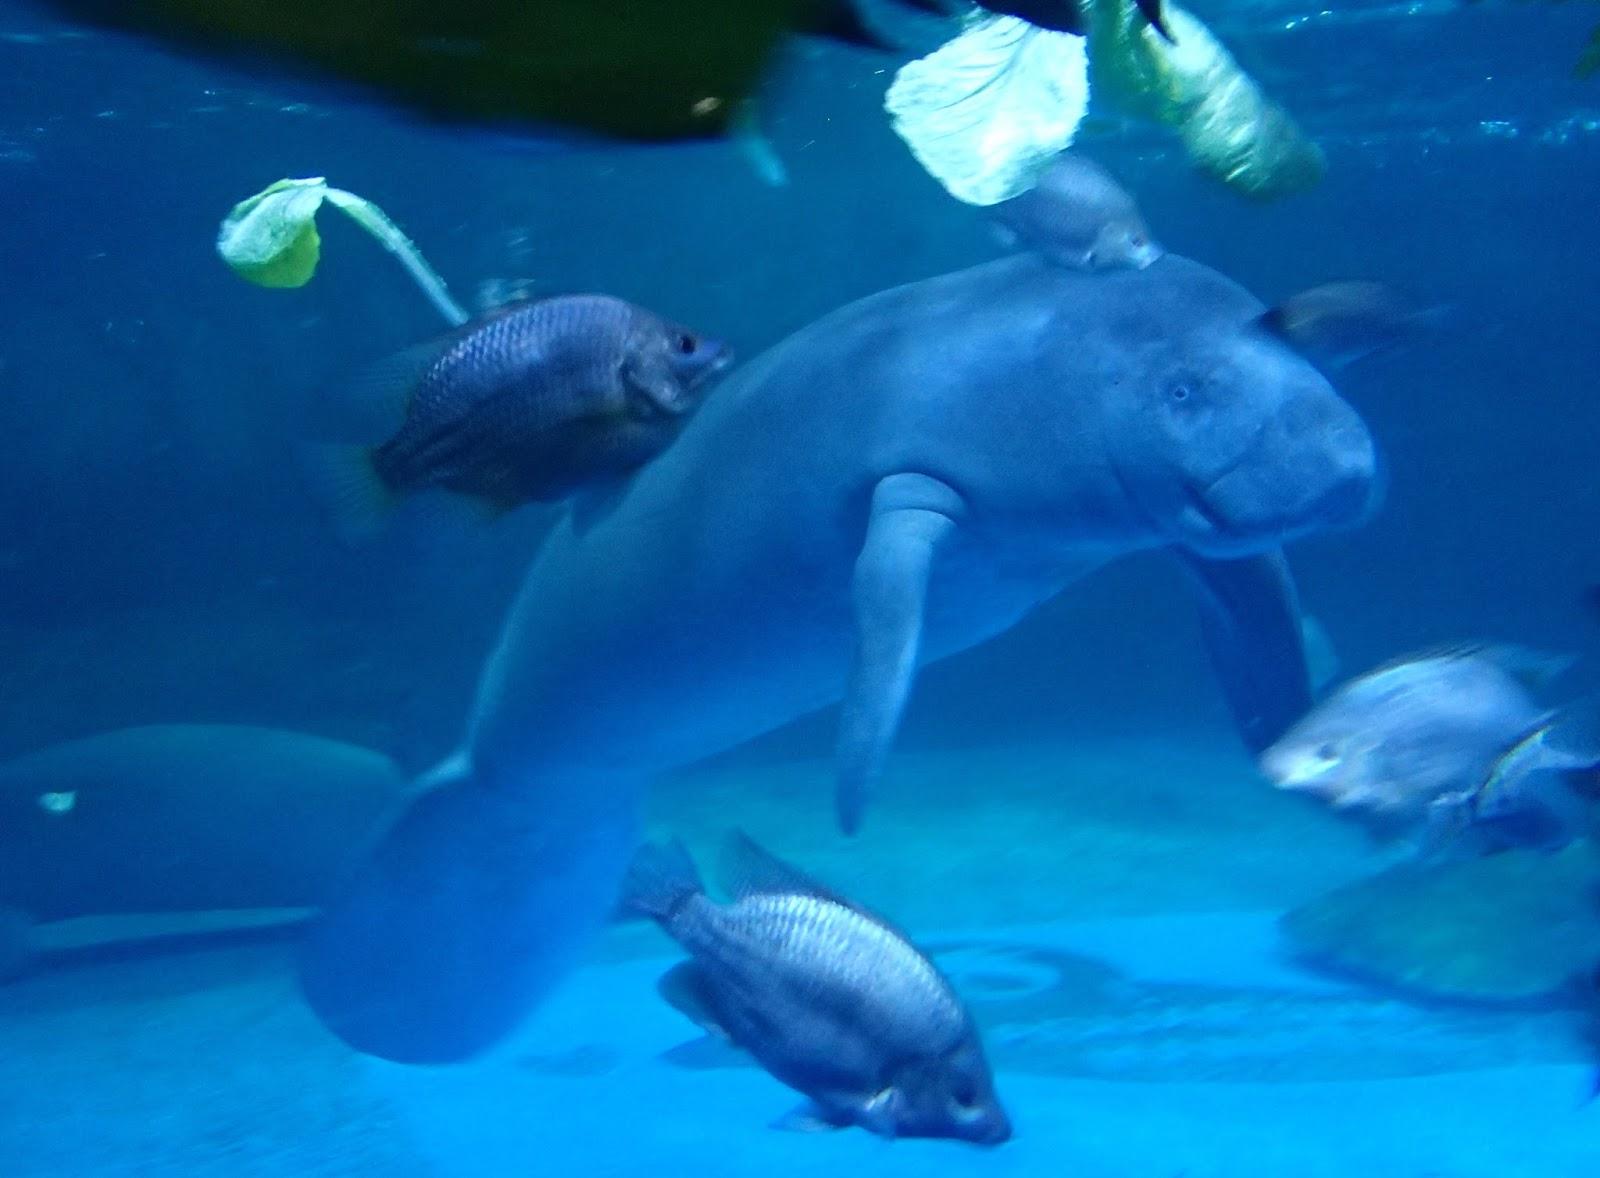 News from shirley japan korea may 28 2016 Manatee aquarium